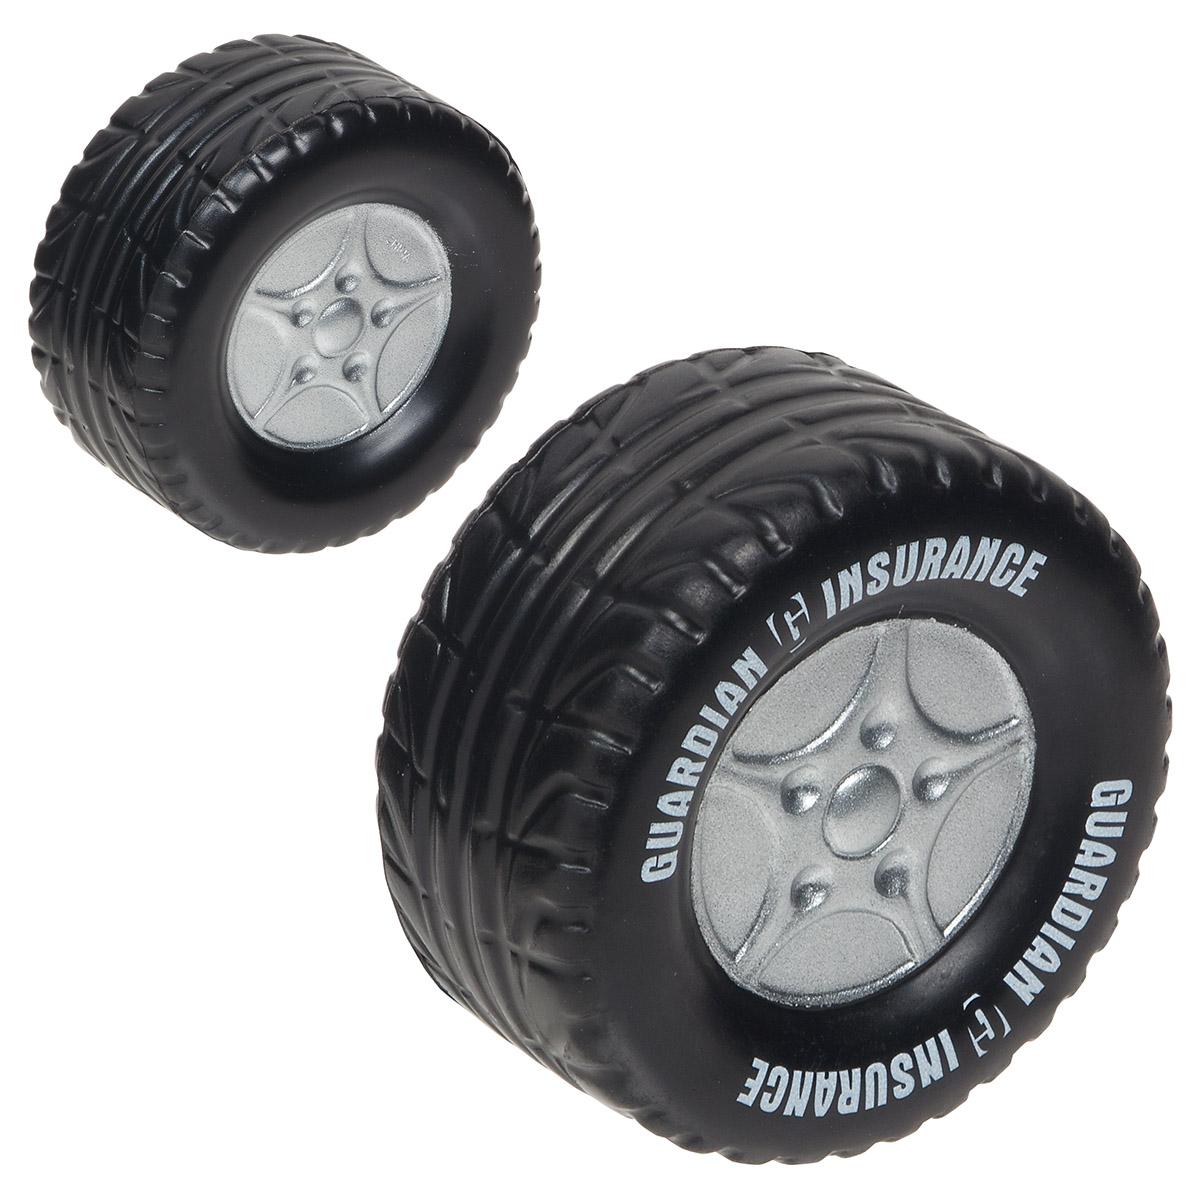 Tire Stress Reliever, LTR-TR15 - 1 Colour Imprint